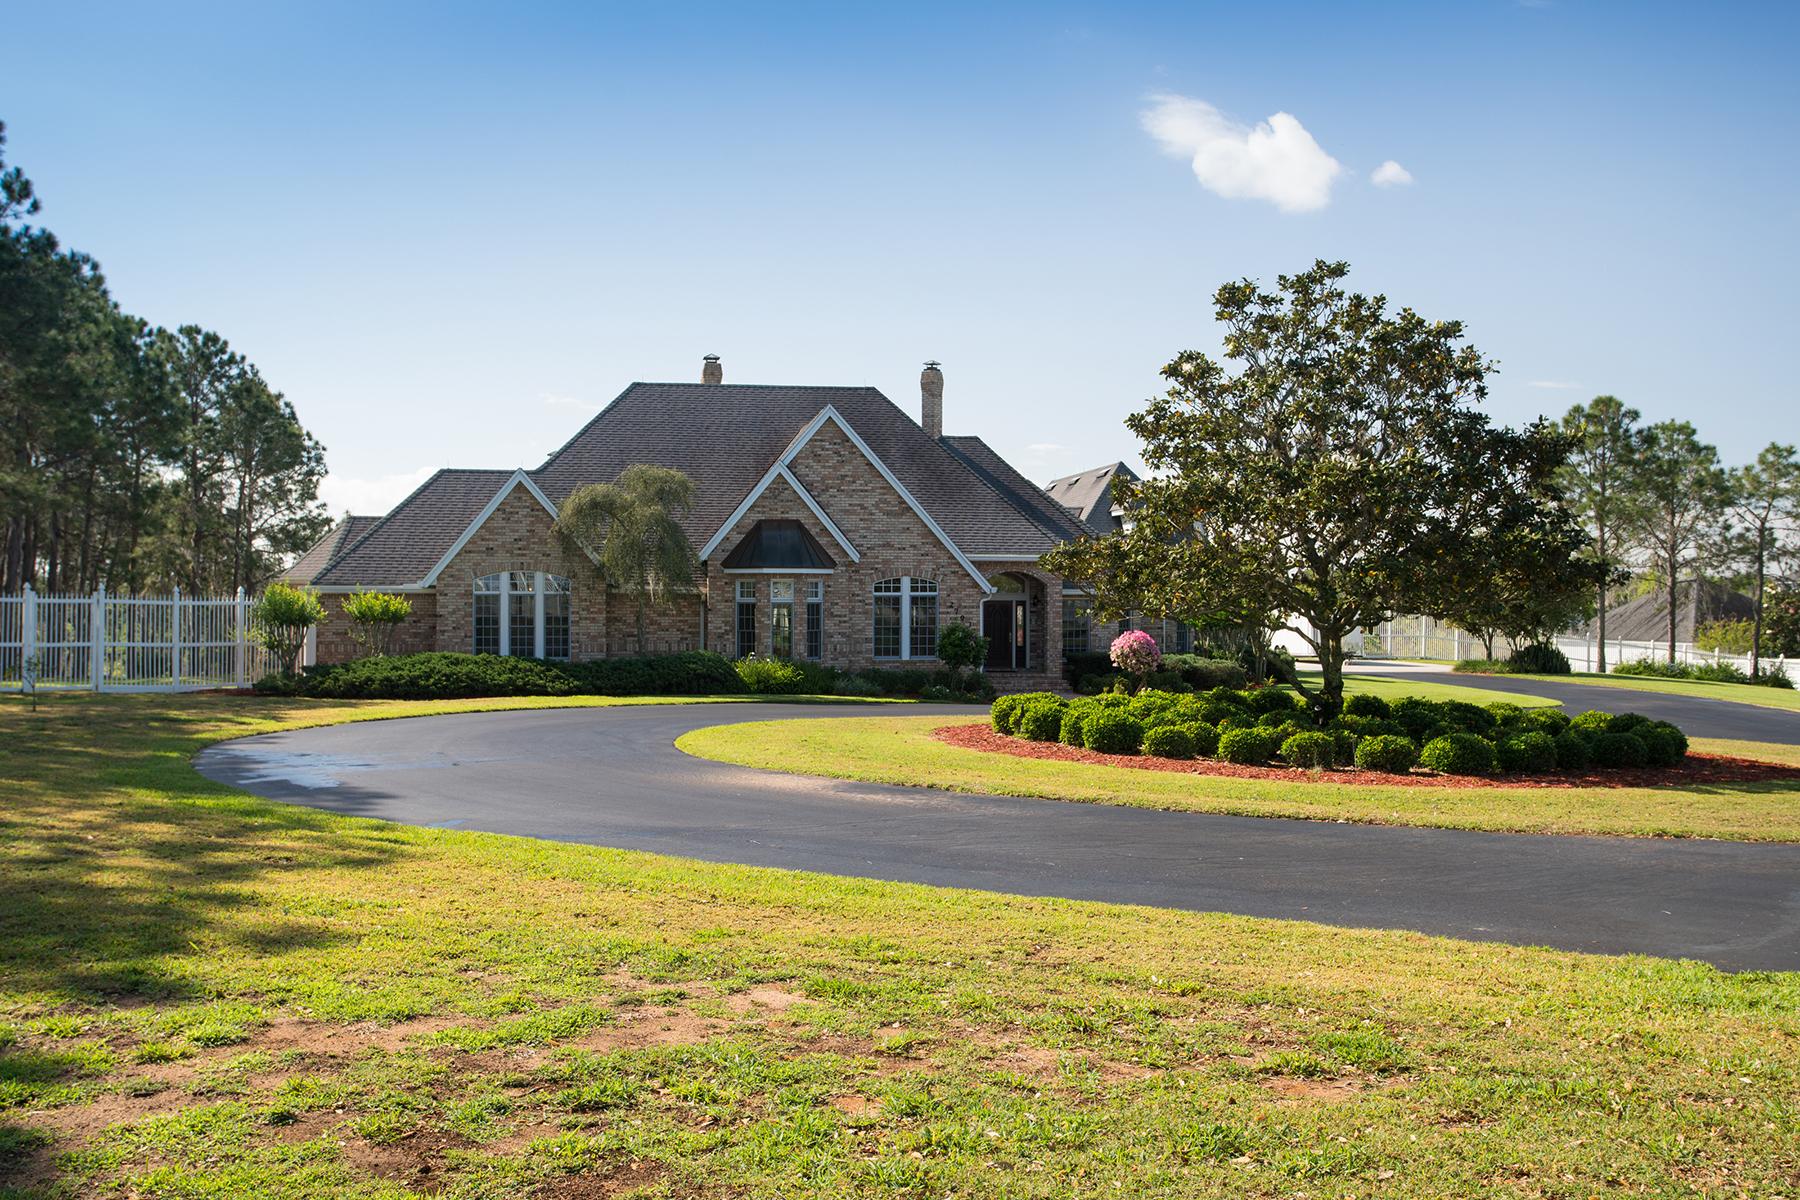 Single Family Home for Sale at Mt. Dora 27930 Lake Jem Rd, Mount Dora, Florida, 32757 United States